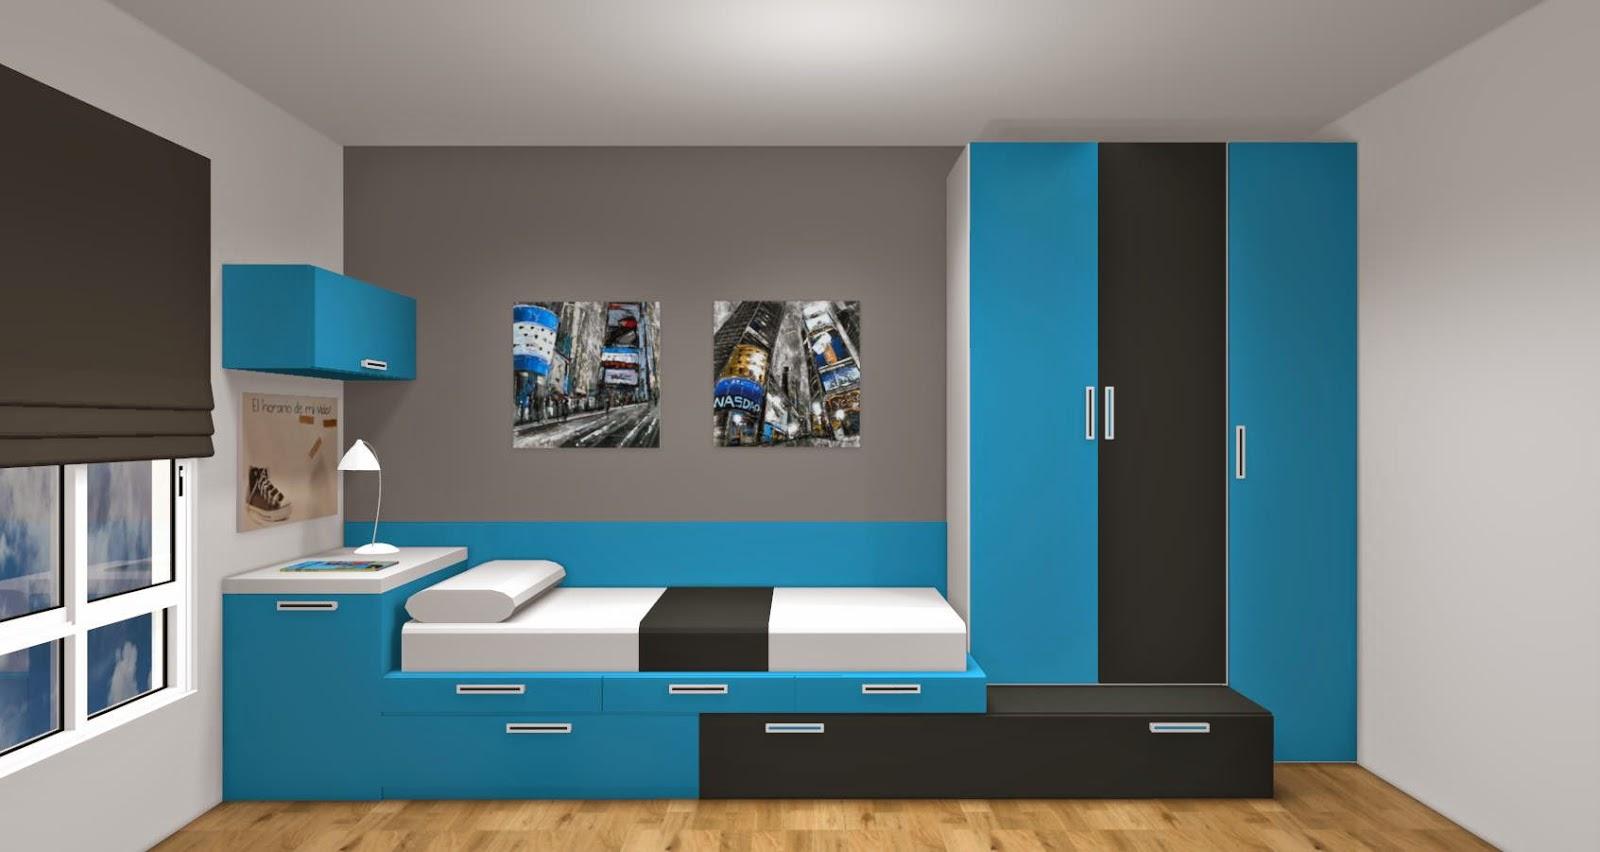 Habitaciones de dise o juveniles - Disenos de cuartos juveniles ...